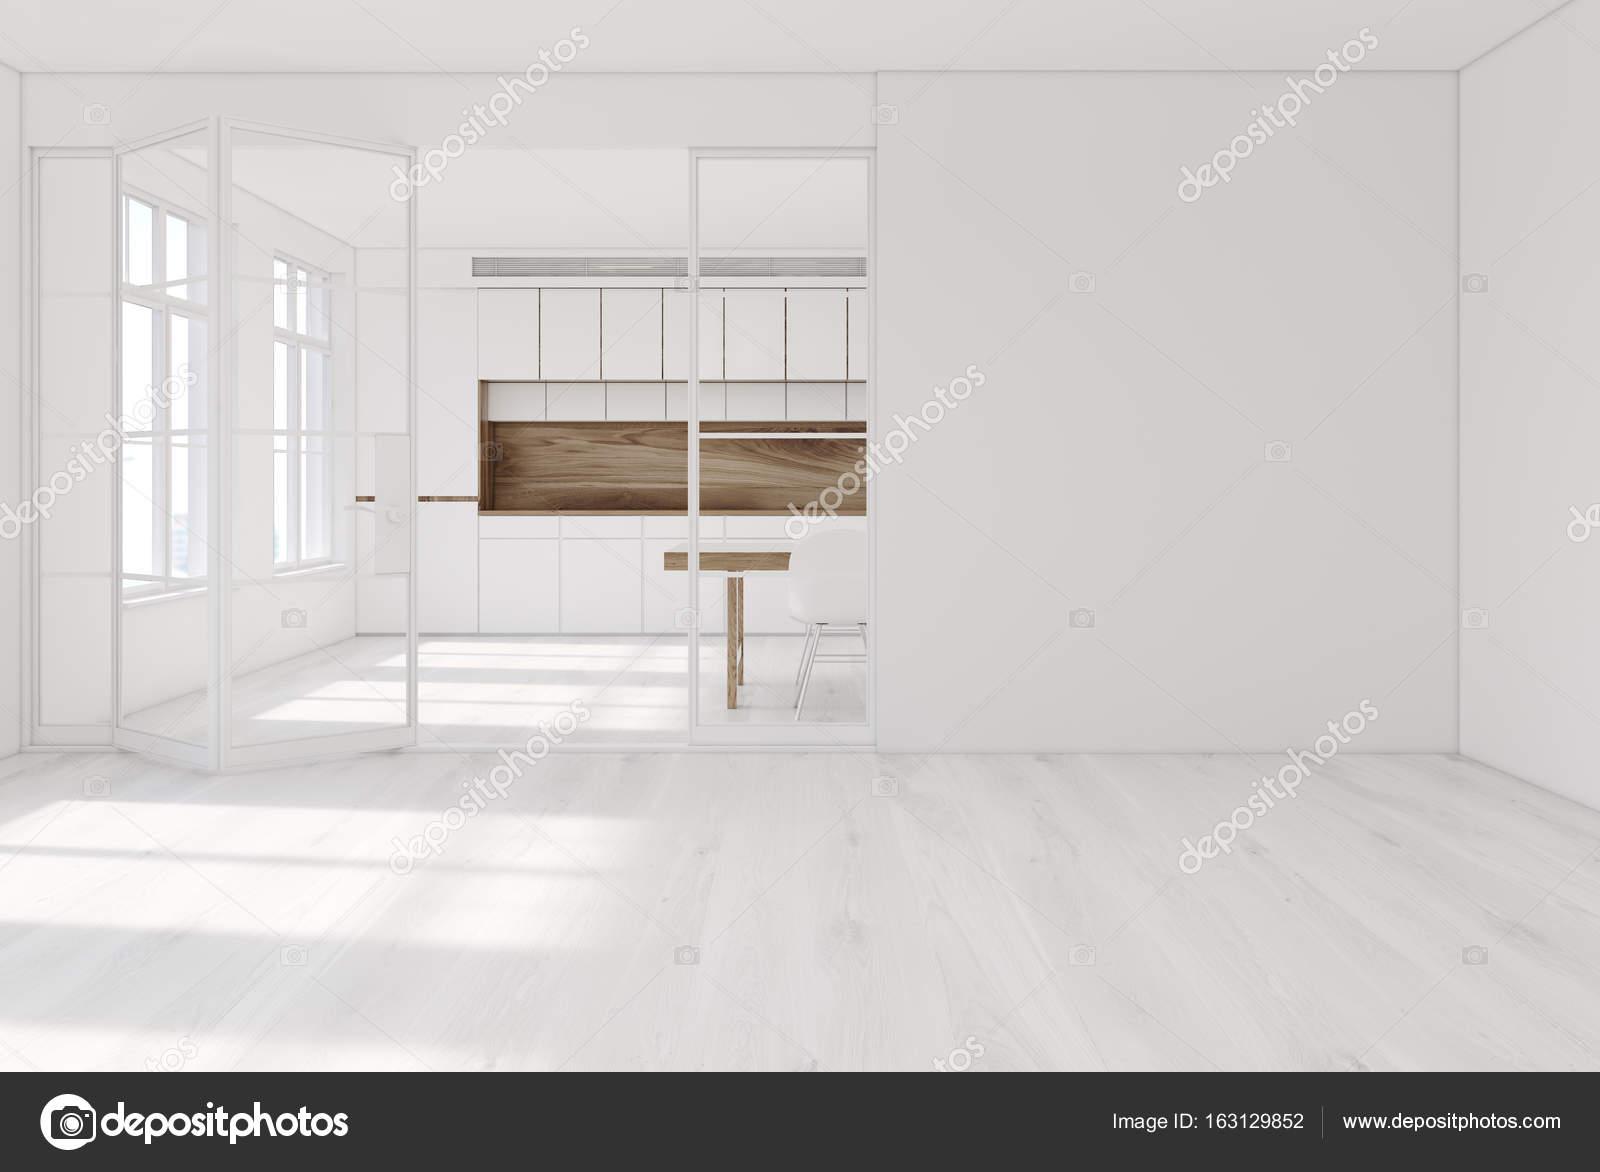 Paredes blancas puertas blancas finest best d interior for Paredes y puertas blancas